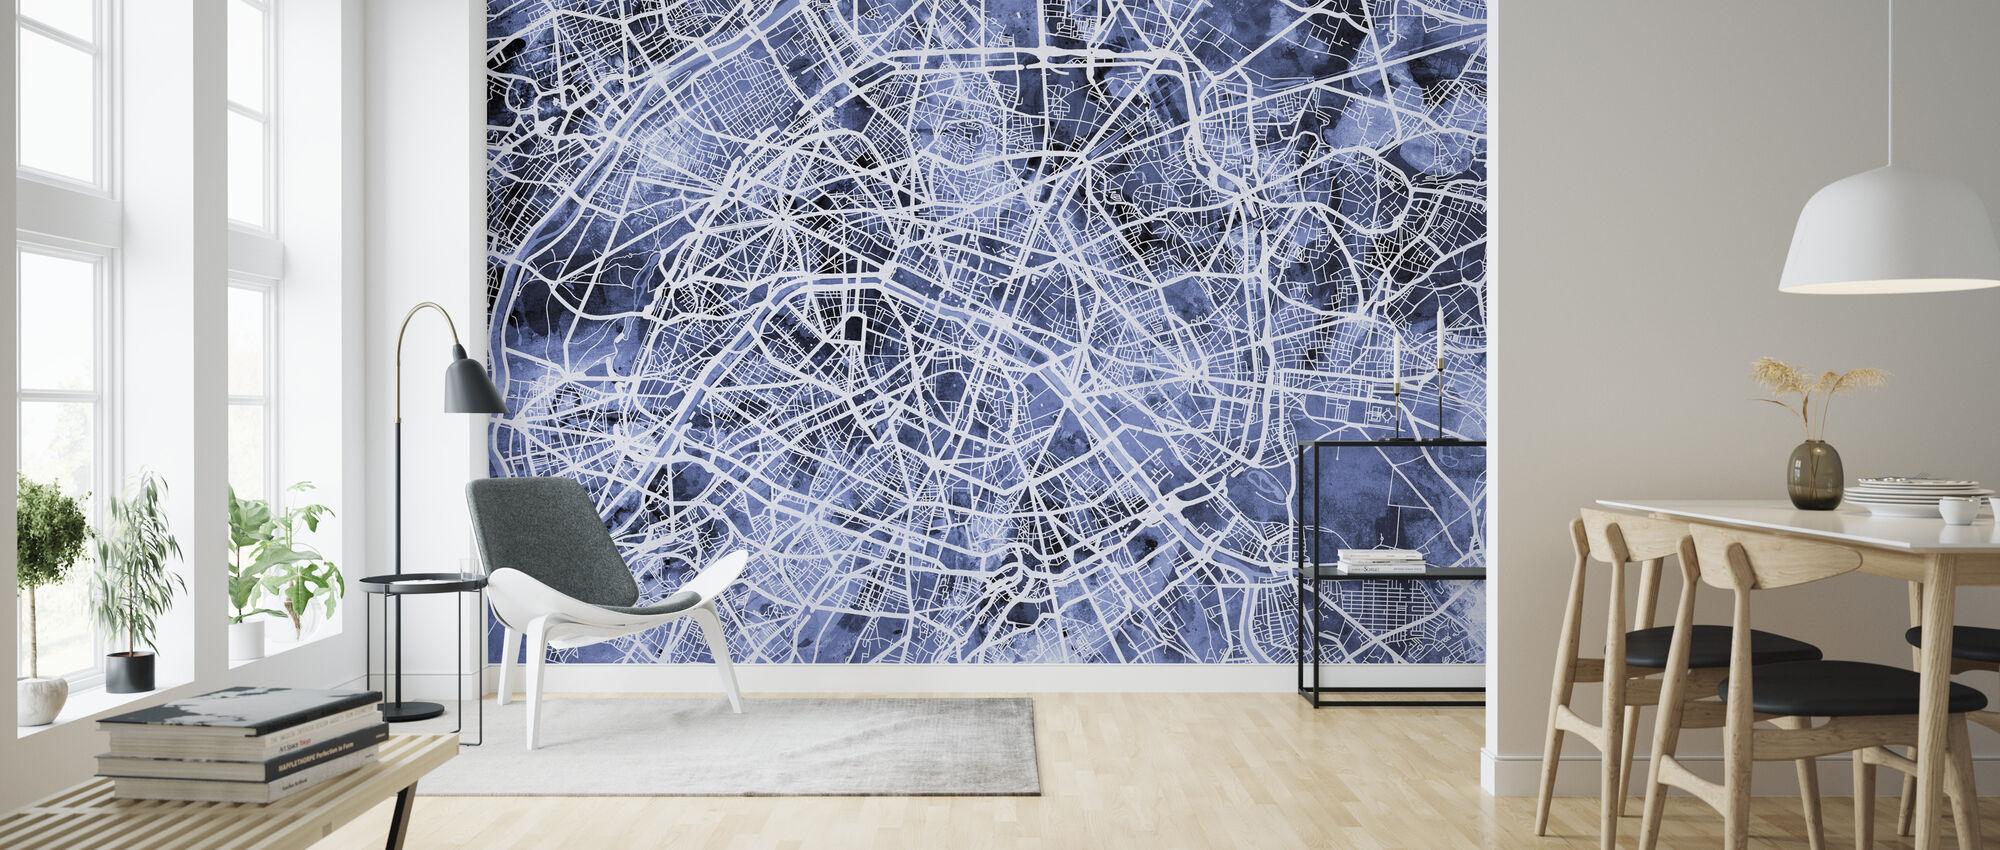 Paris France City Street Map - Wallpaper - Living Room